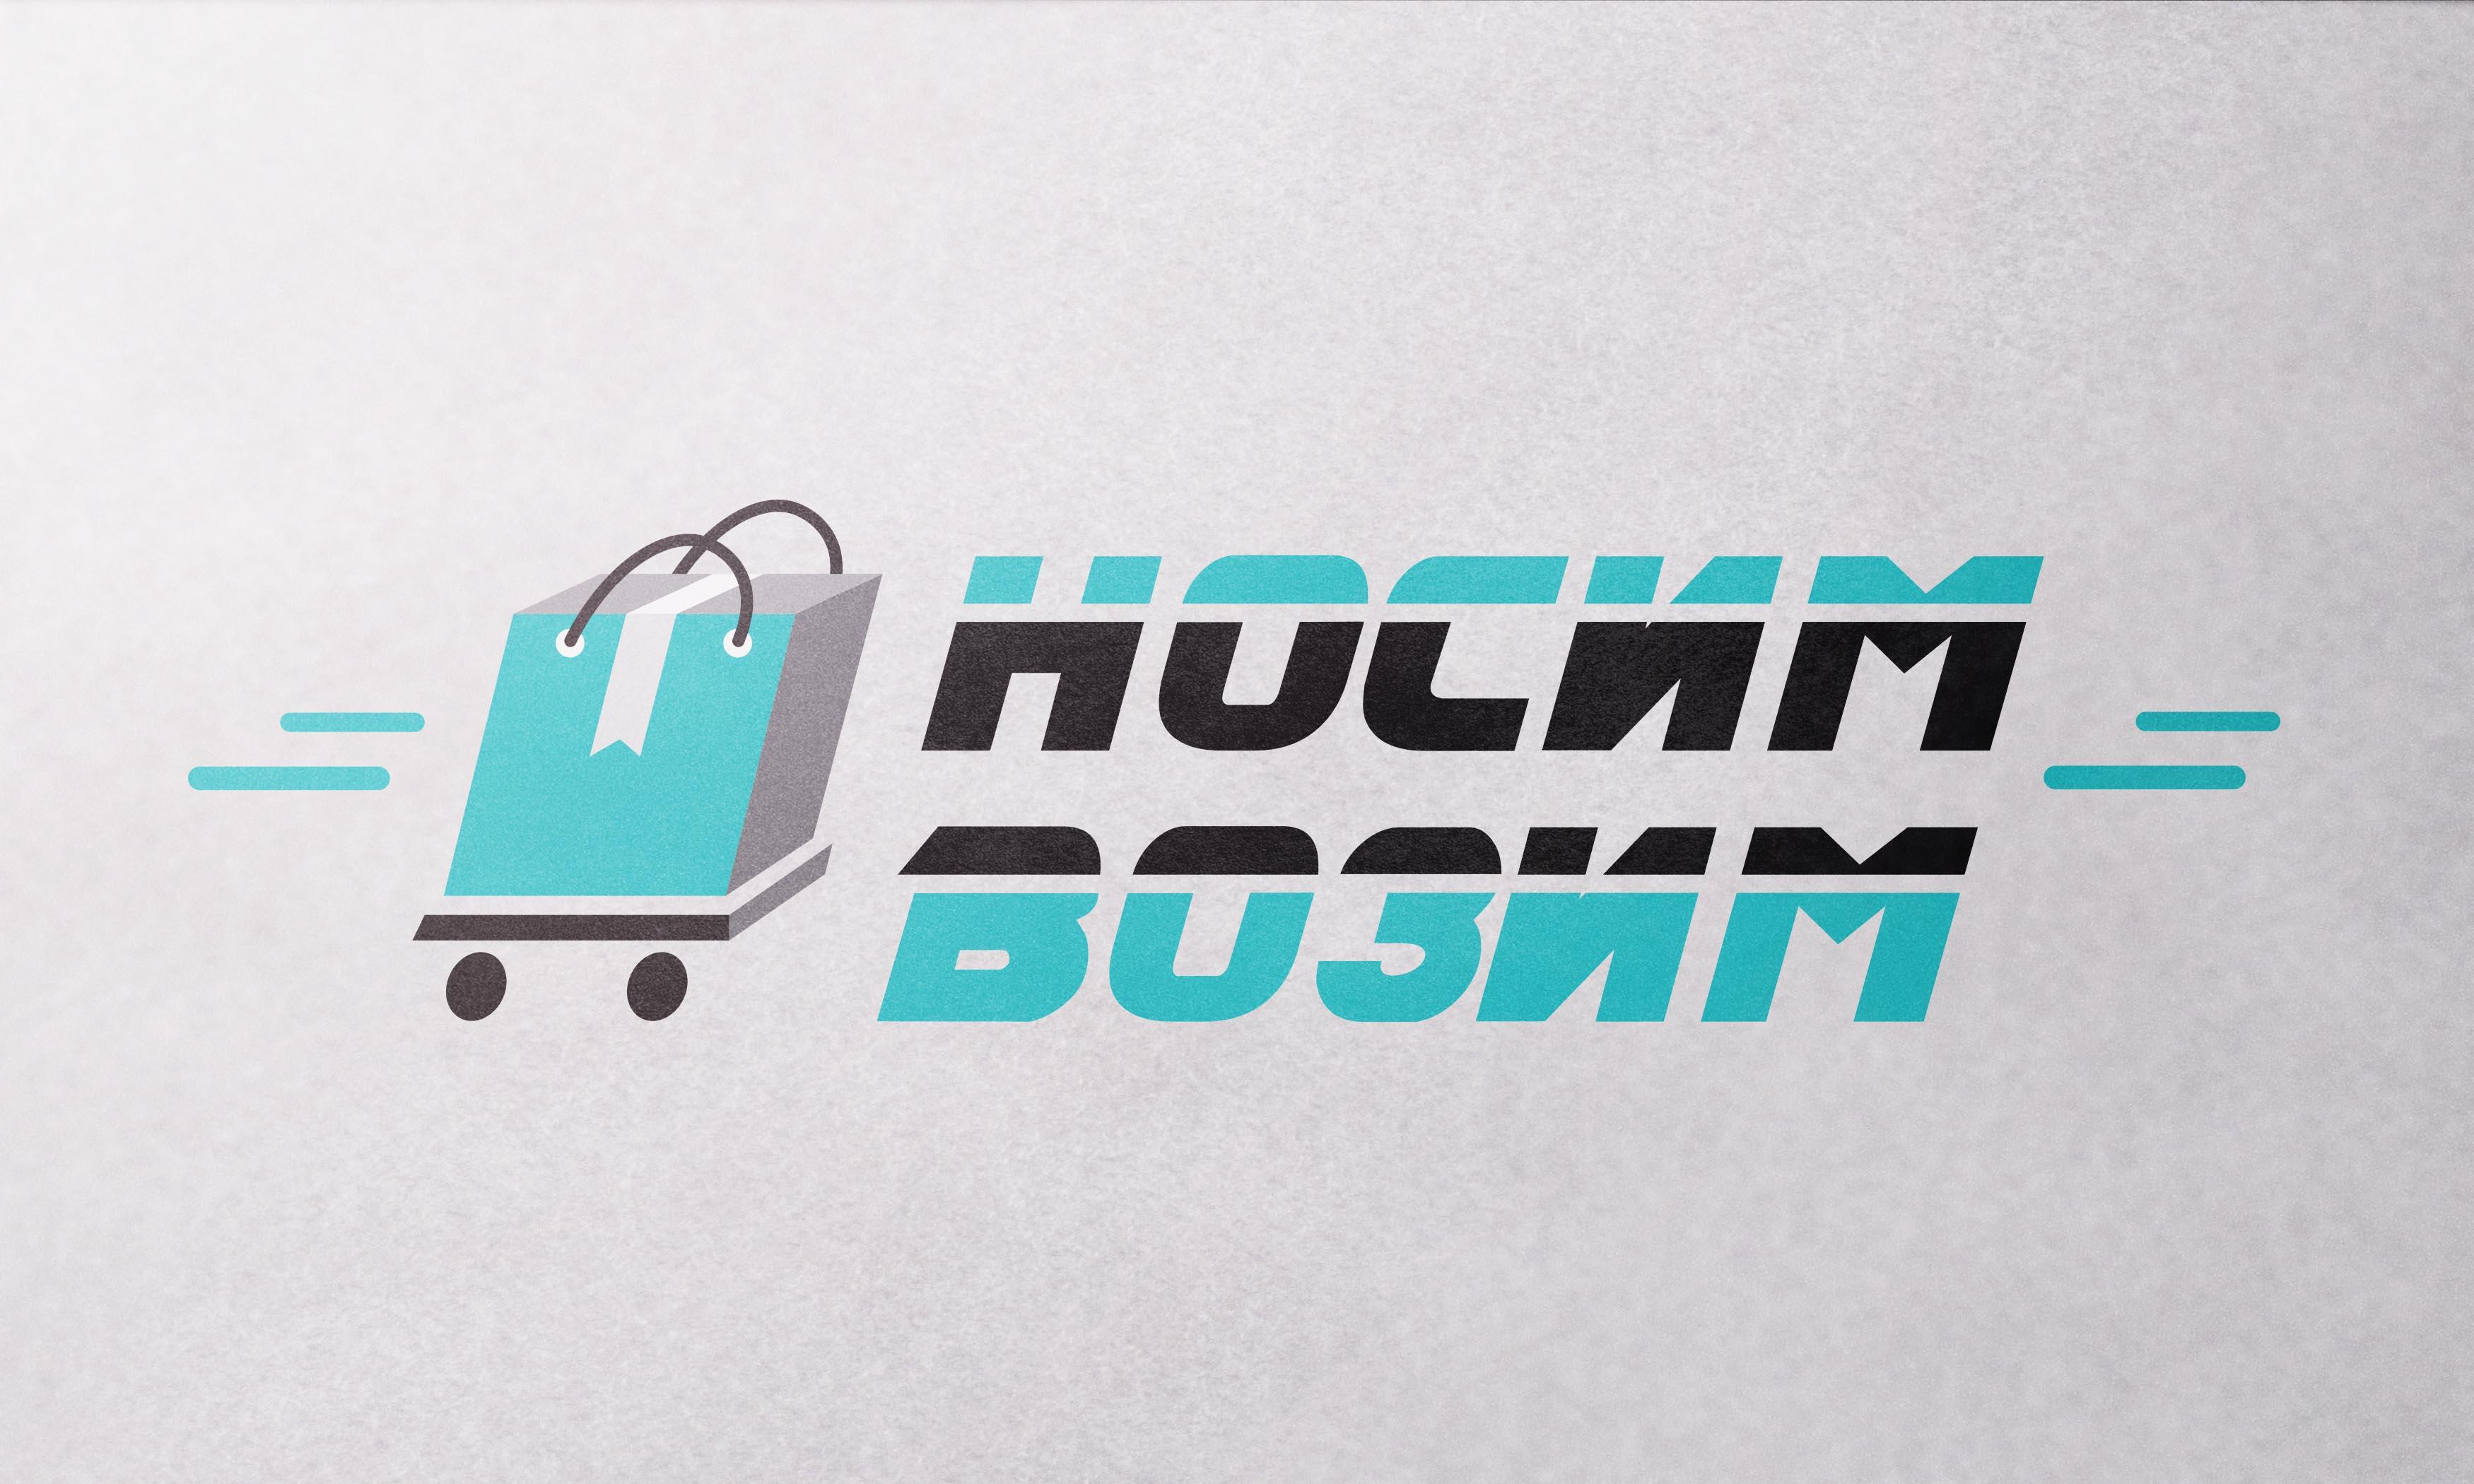 Логотип компании по перевозкам НосимВозим фото f_2285cf74be206ee1.jpg